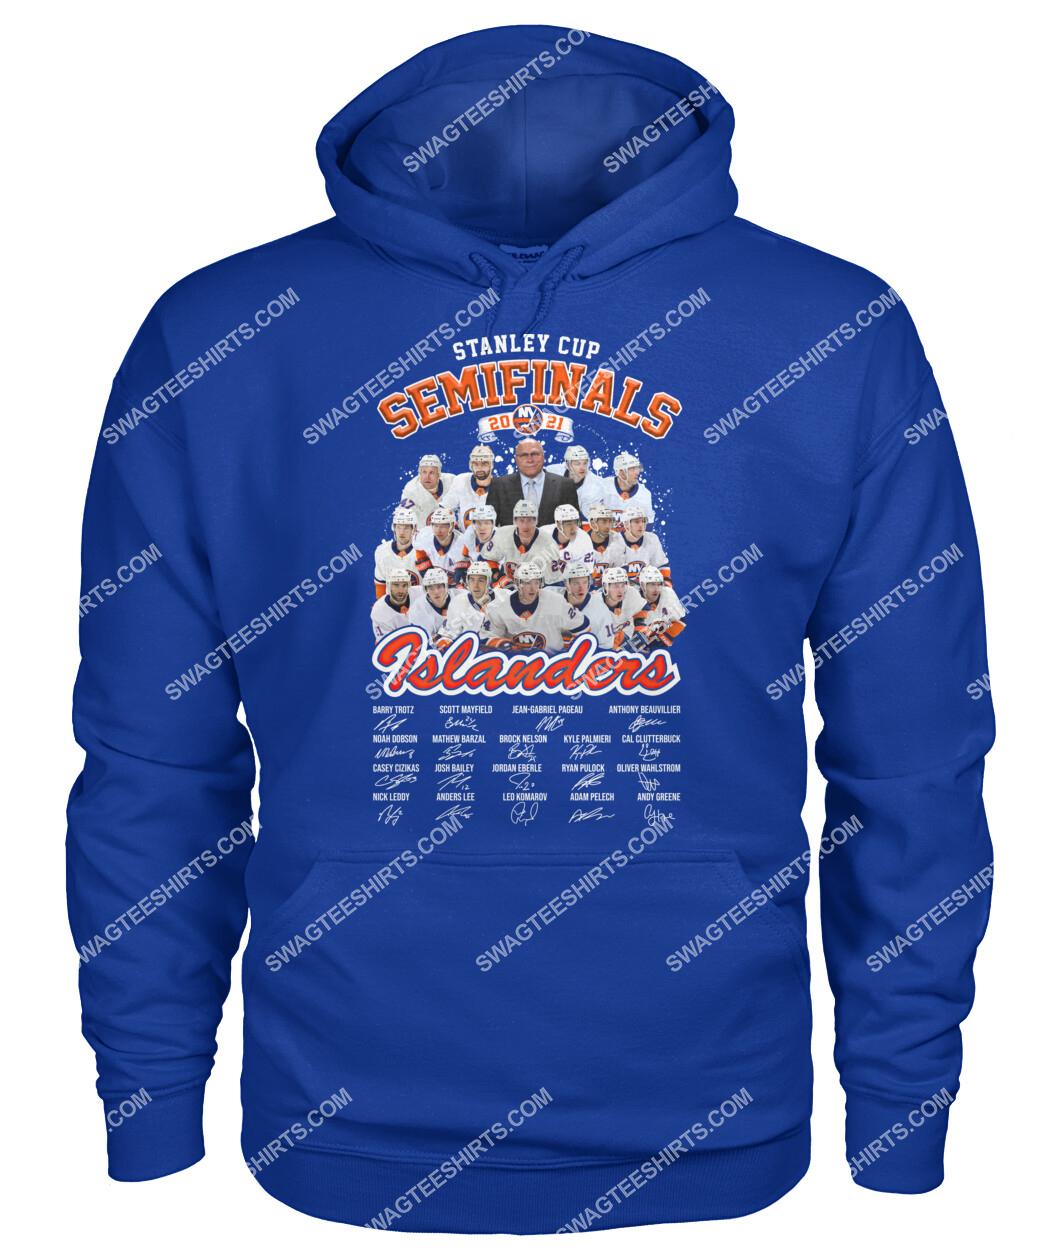 stanley cup semi finals 2021 new york islanders signatures hoodie 1